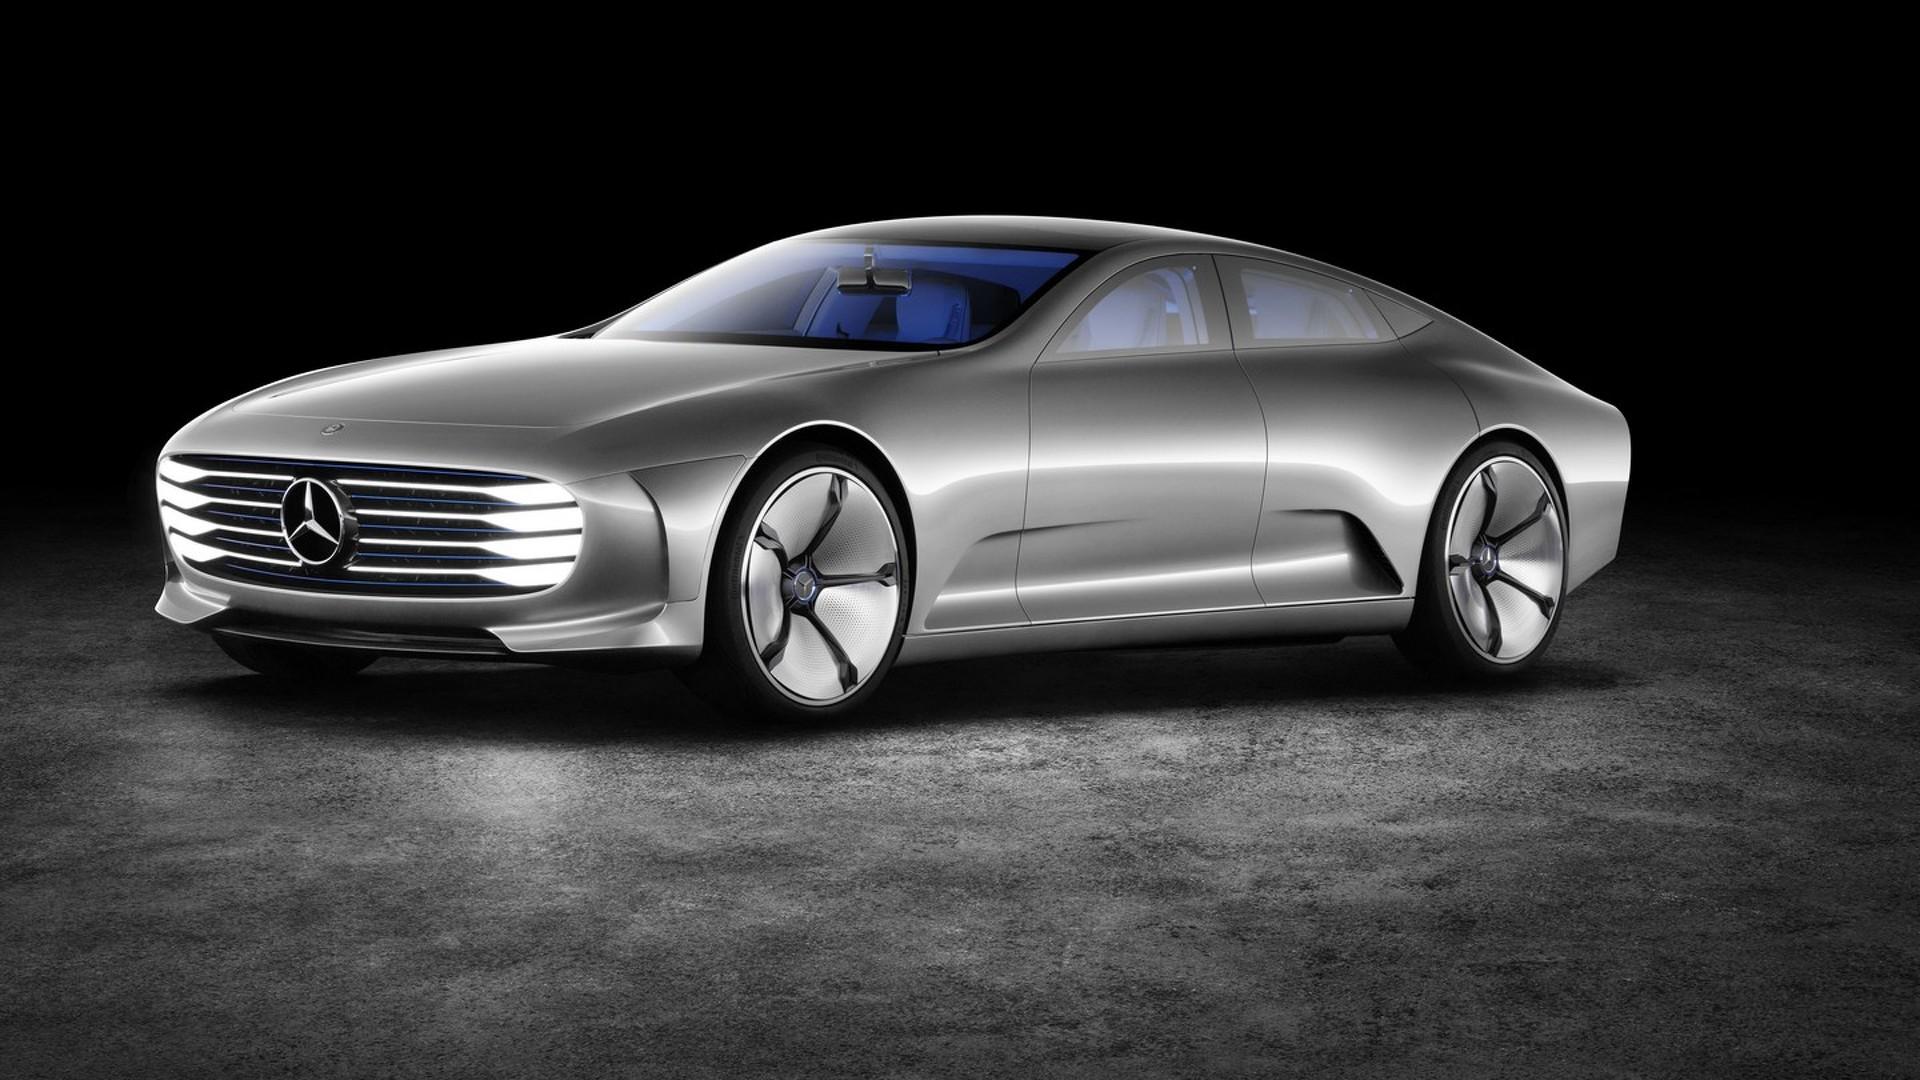 Mercedes\' EV range to target ultra-low drag coefficient via active ...